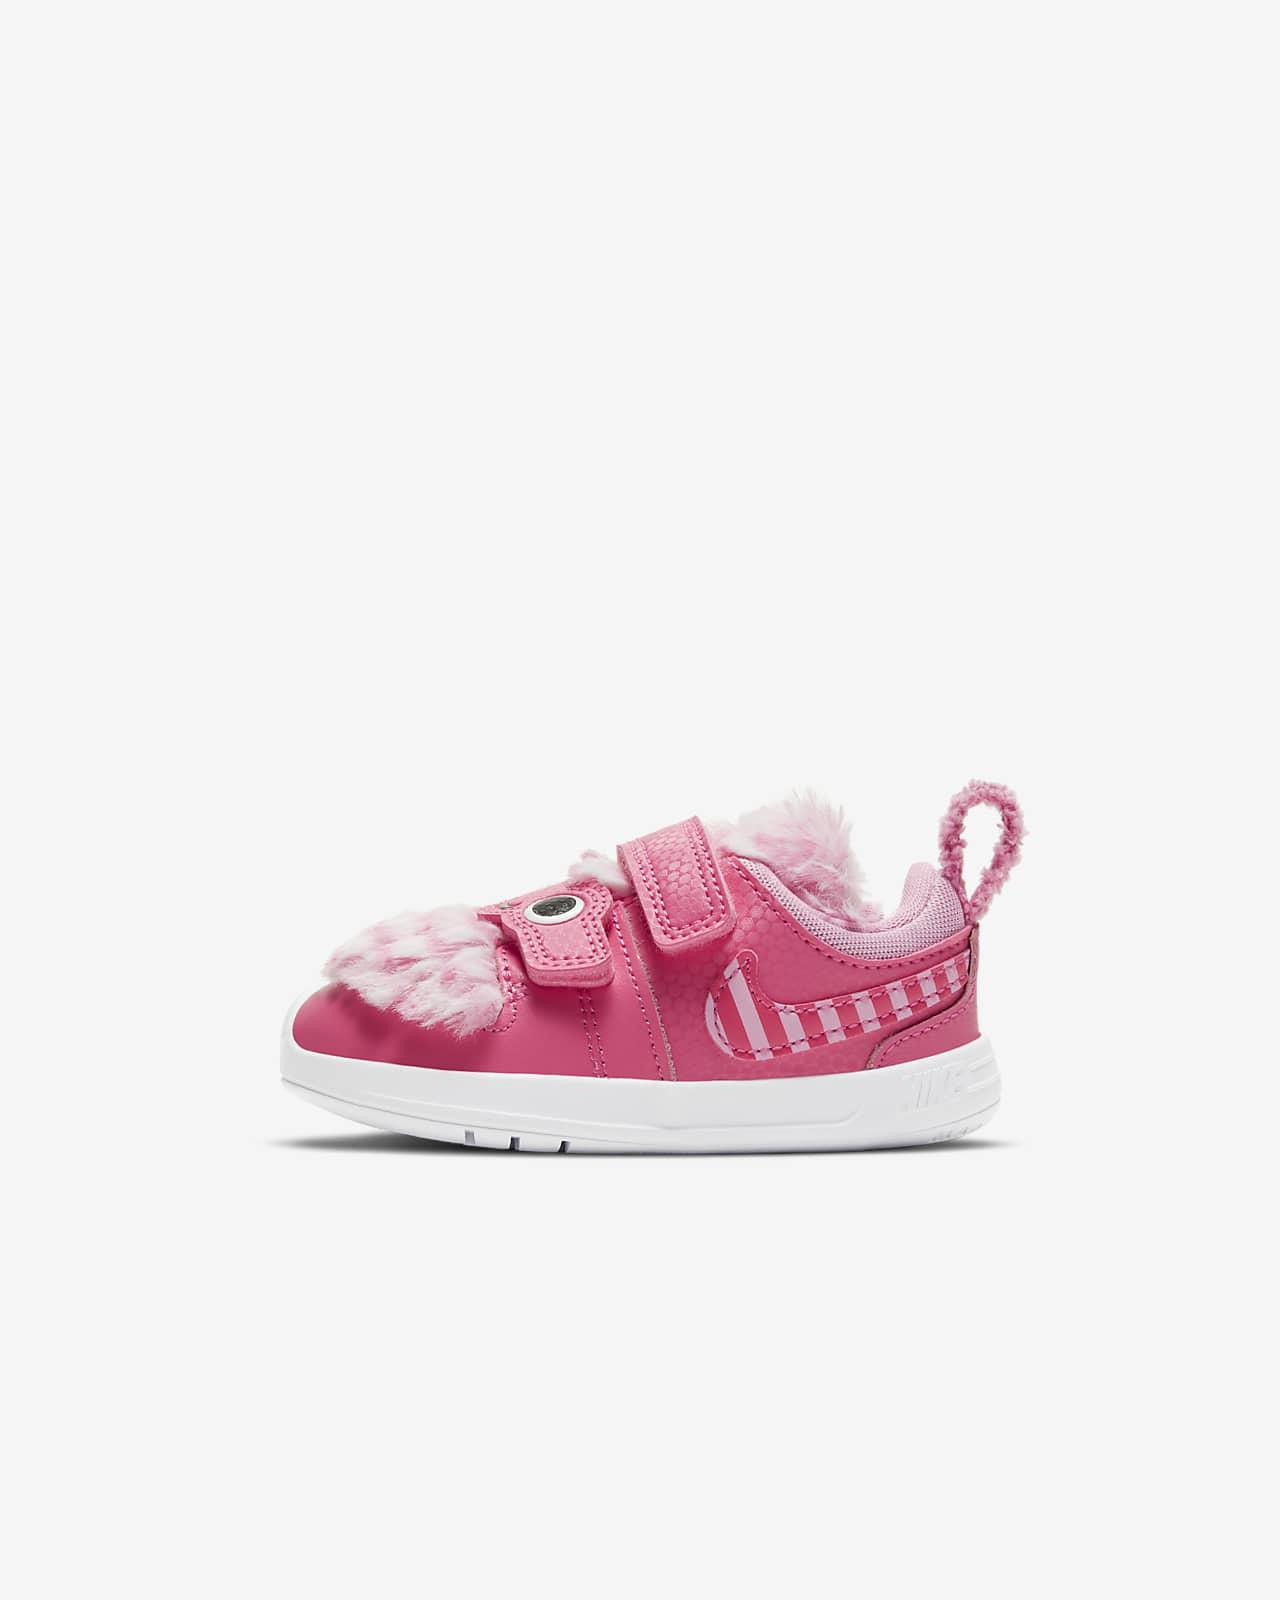 Nike Pico 5 Fast n Furry Baby/Toddler Shoe